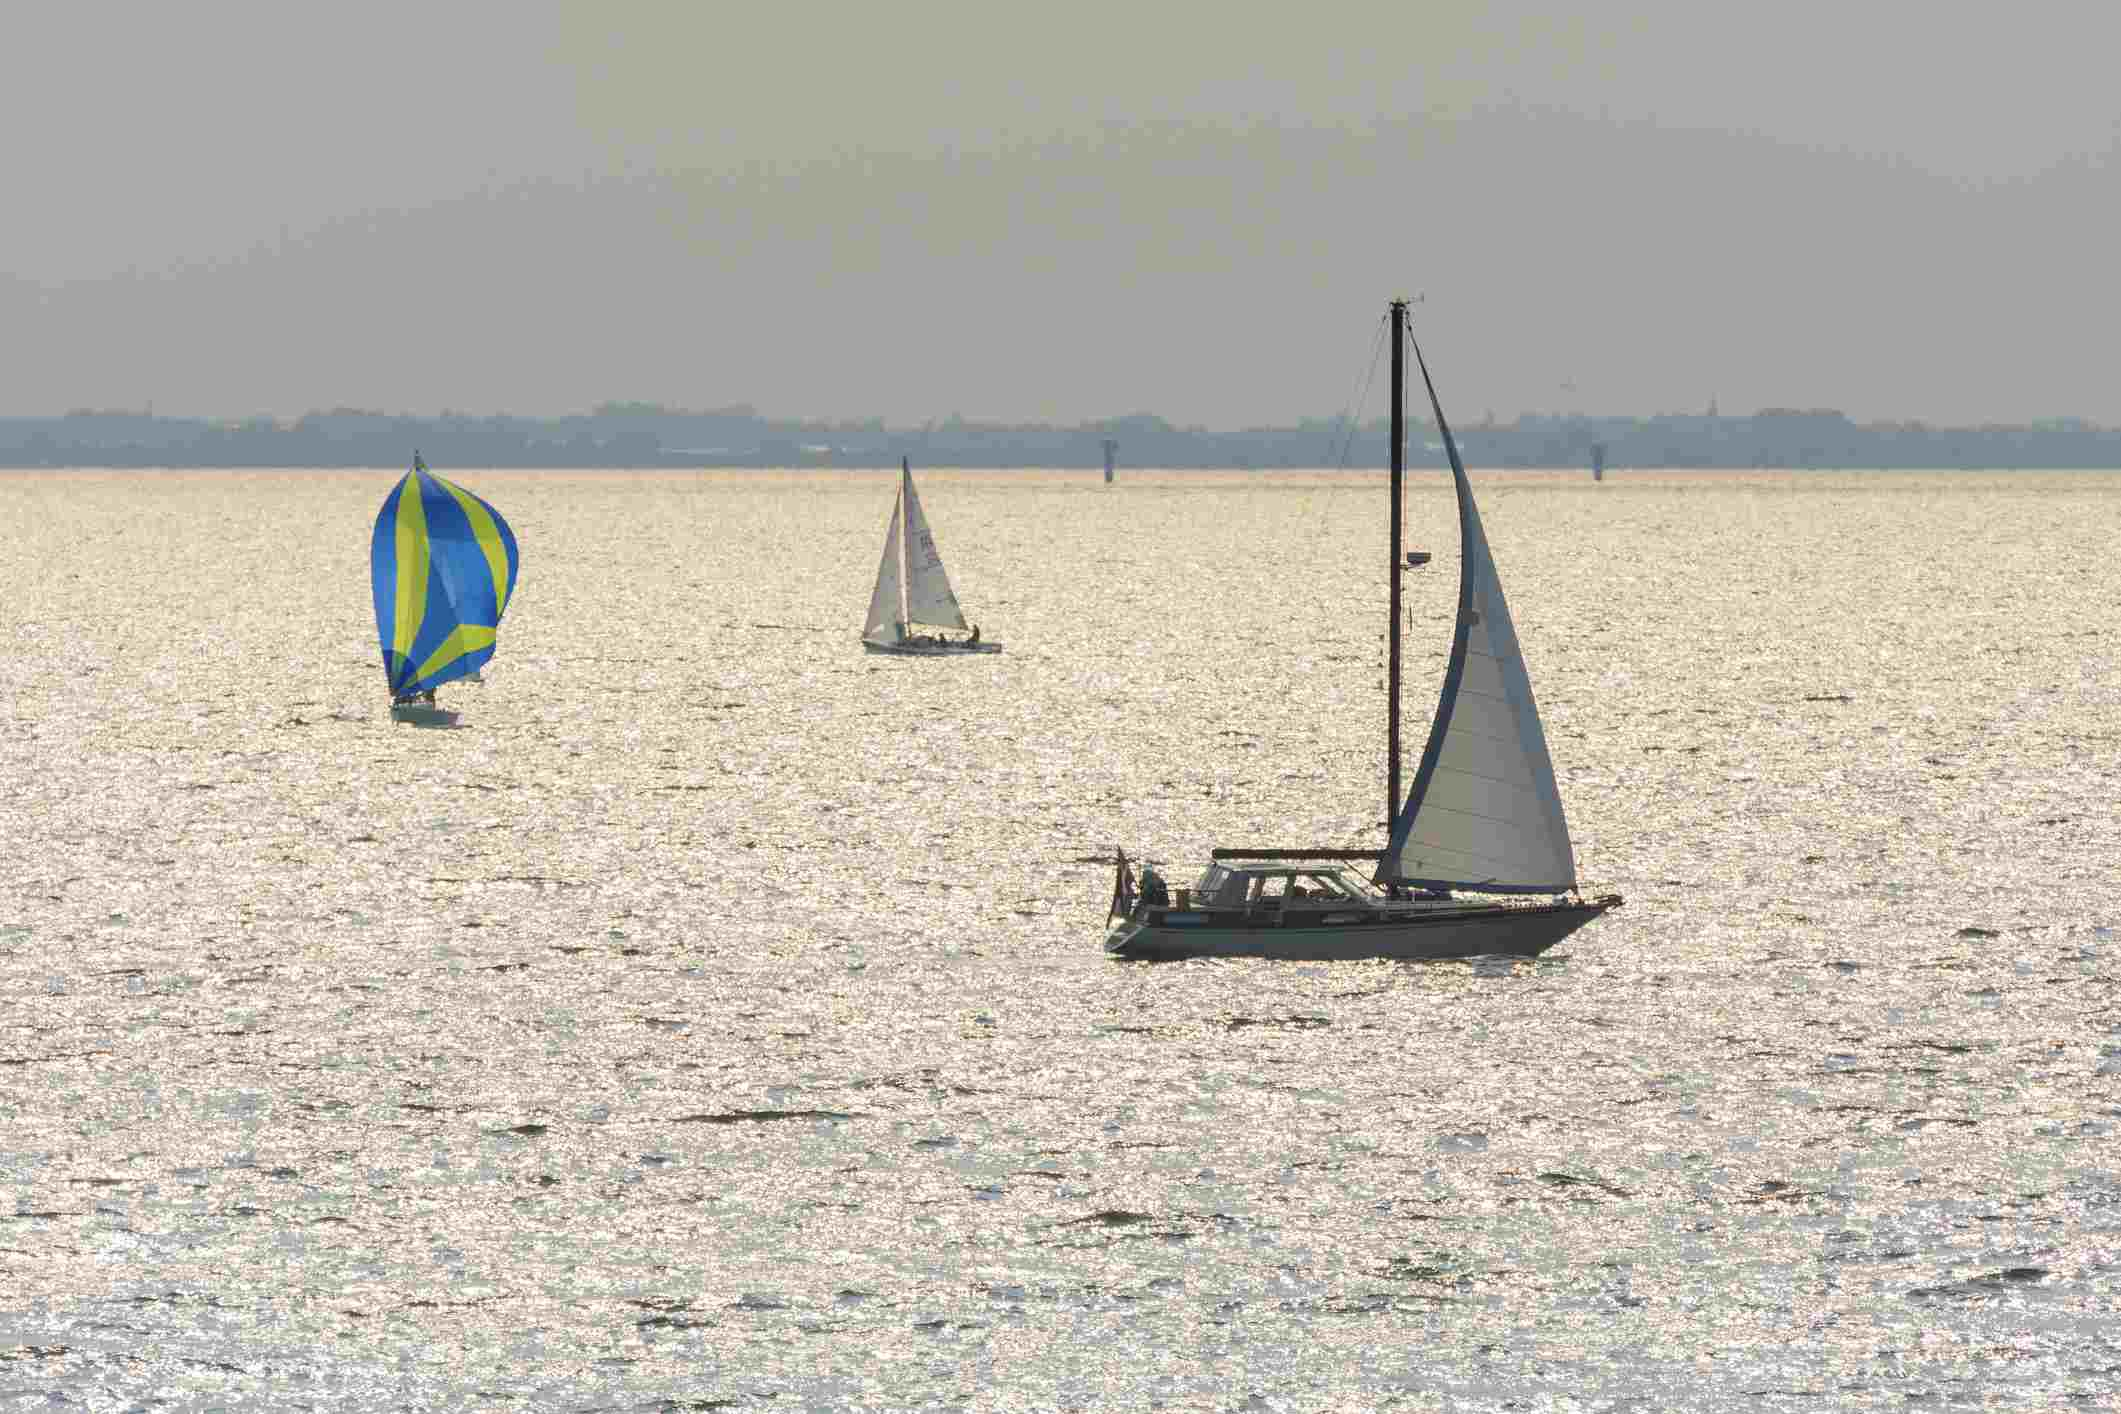 Sailing Ships on Oresund